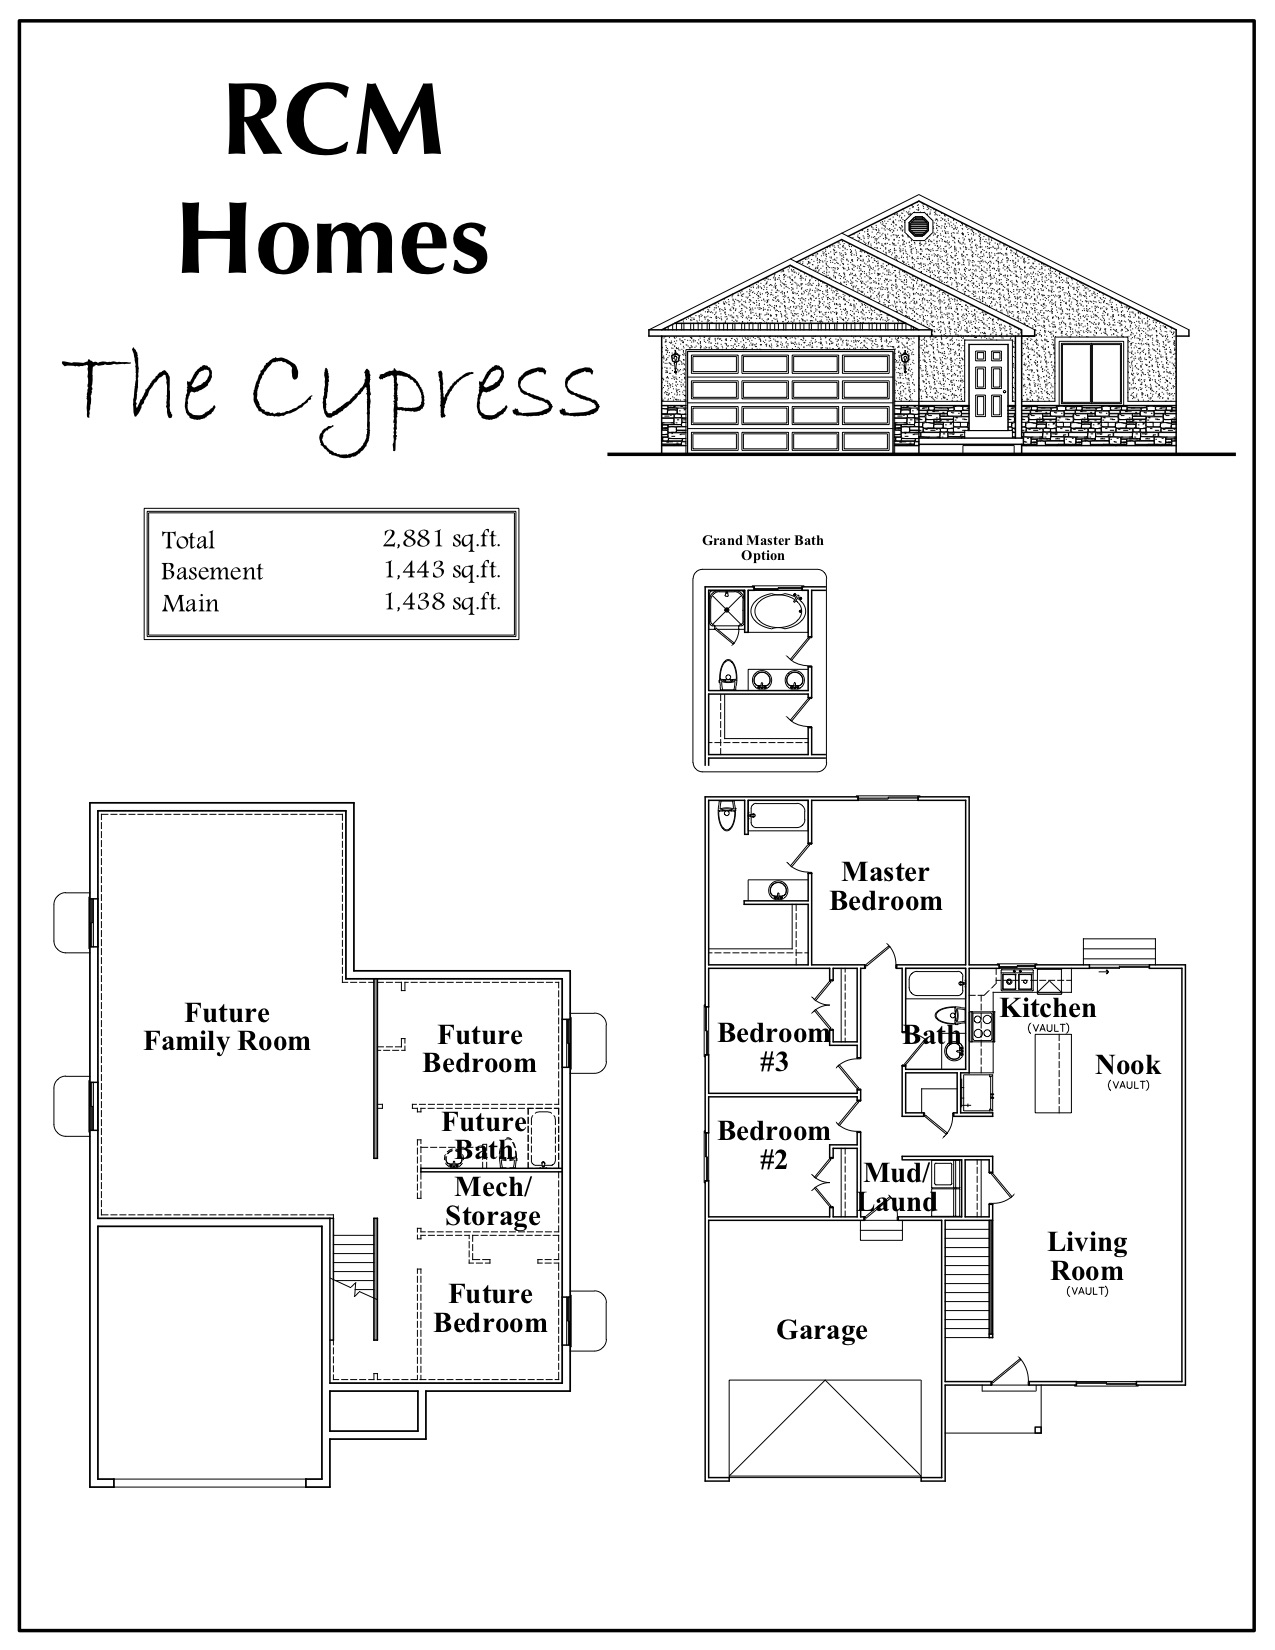 Cypress Image.jpg